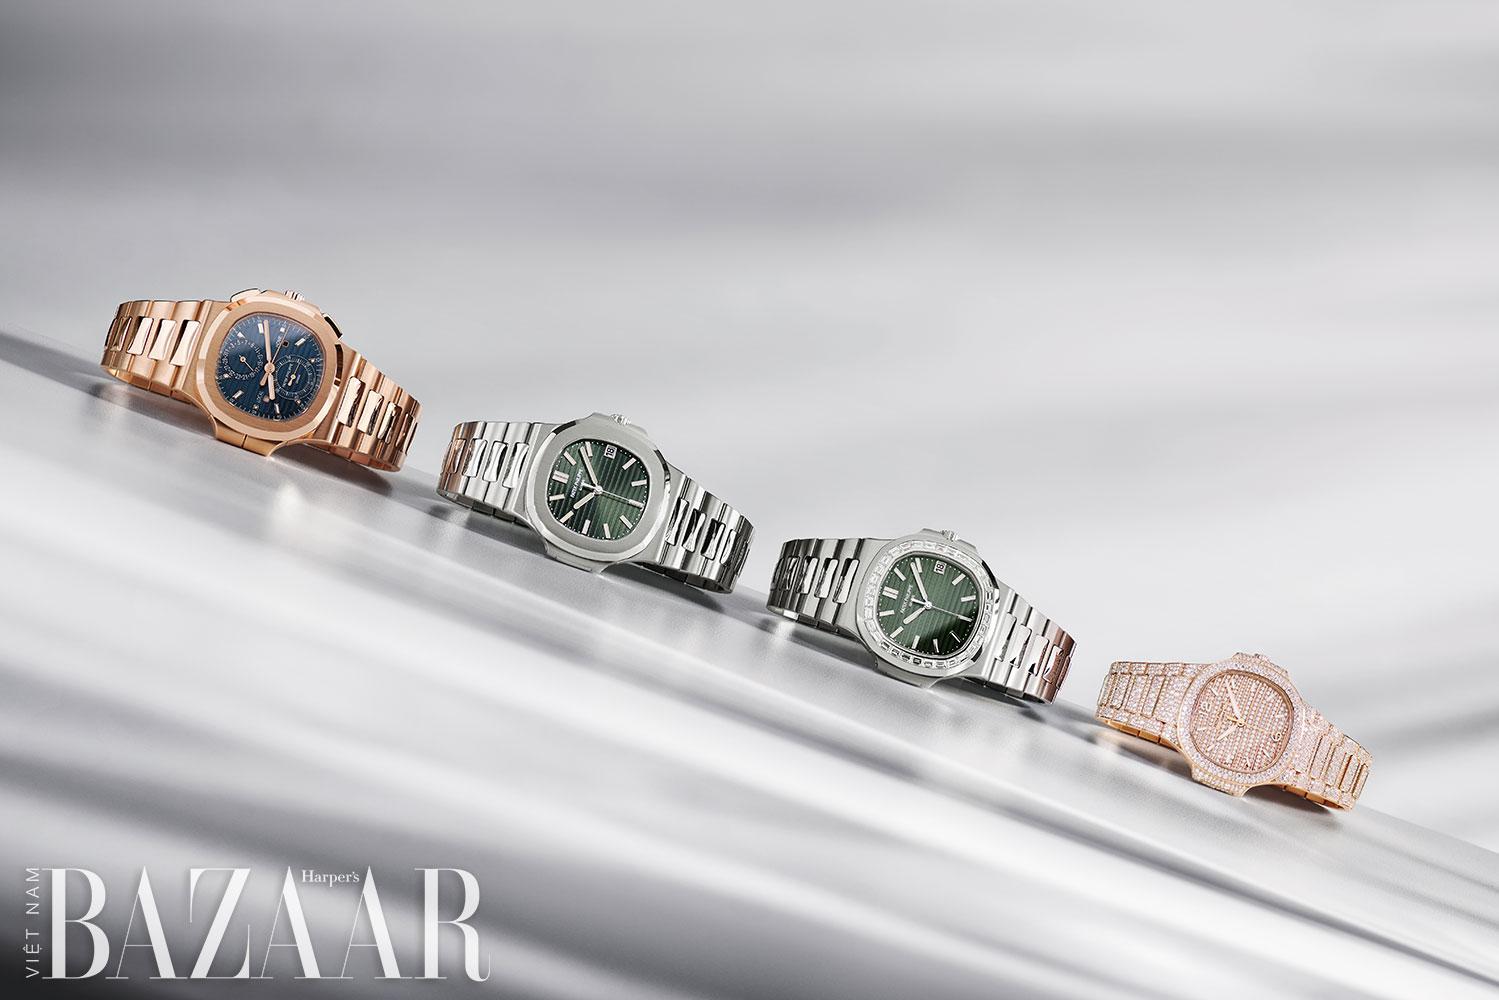 Patek Philippe ra mắt 4 mẫu đồng hồ Nautilus cho 2021 2